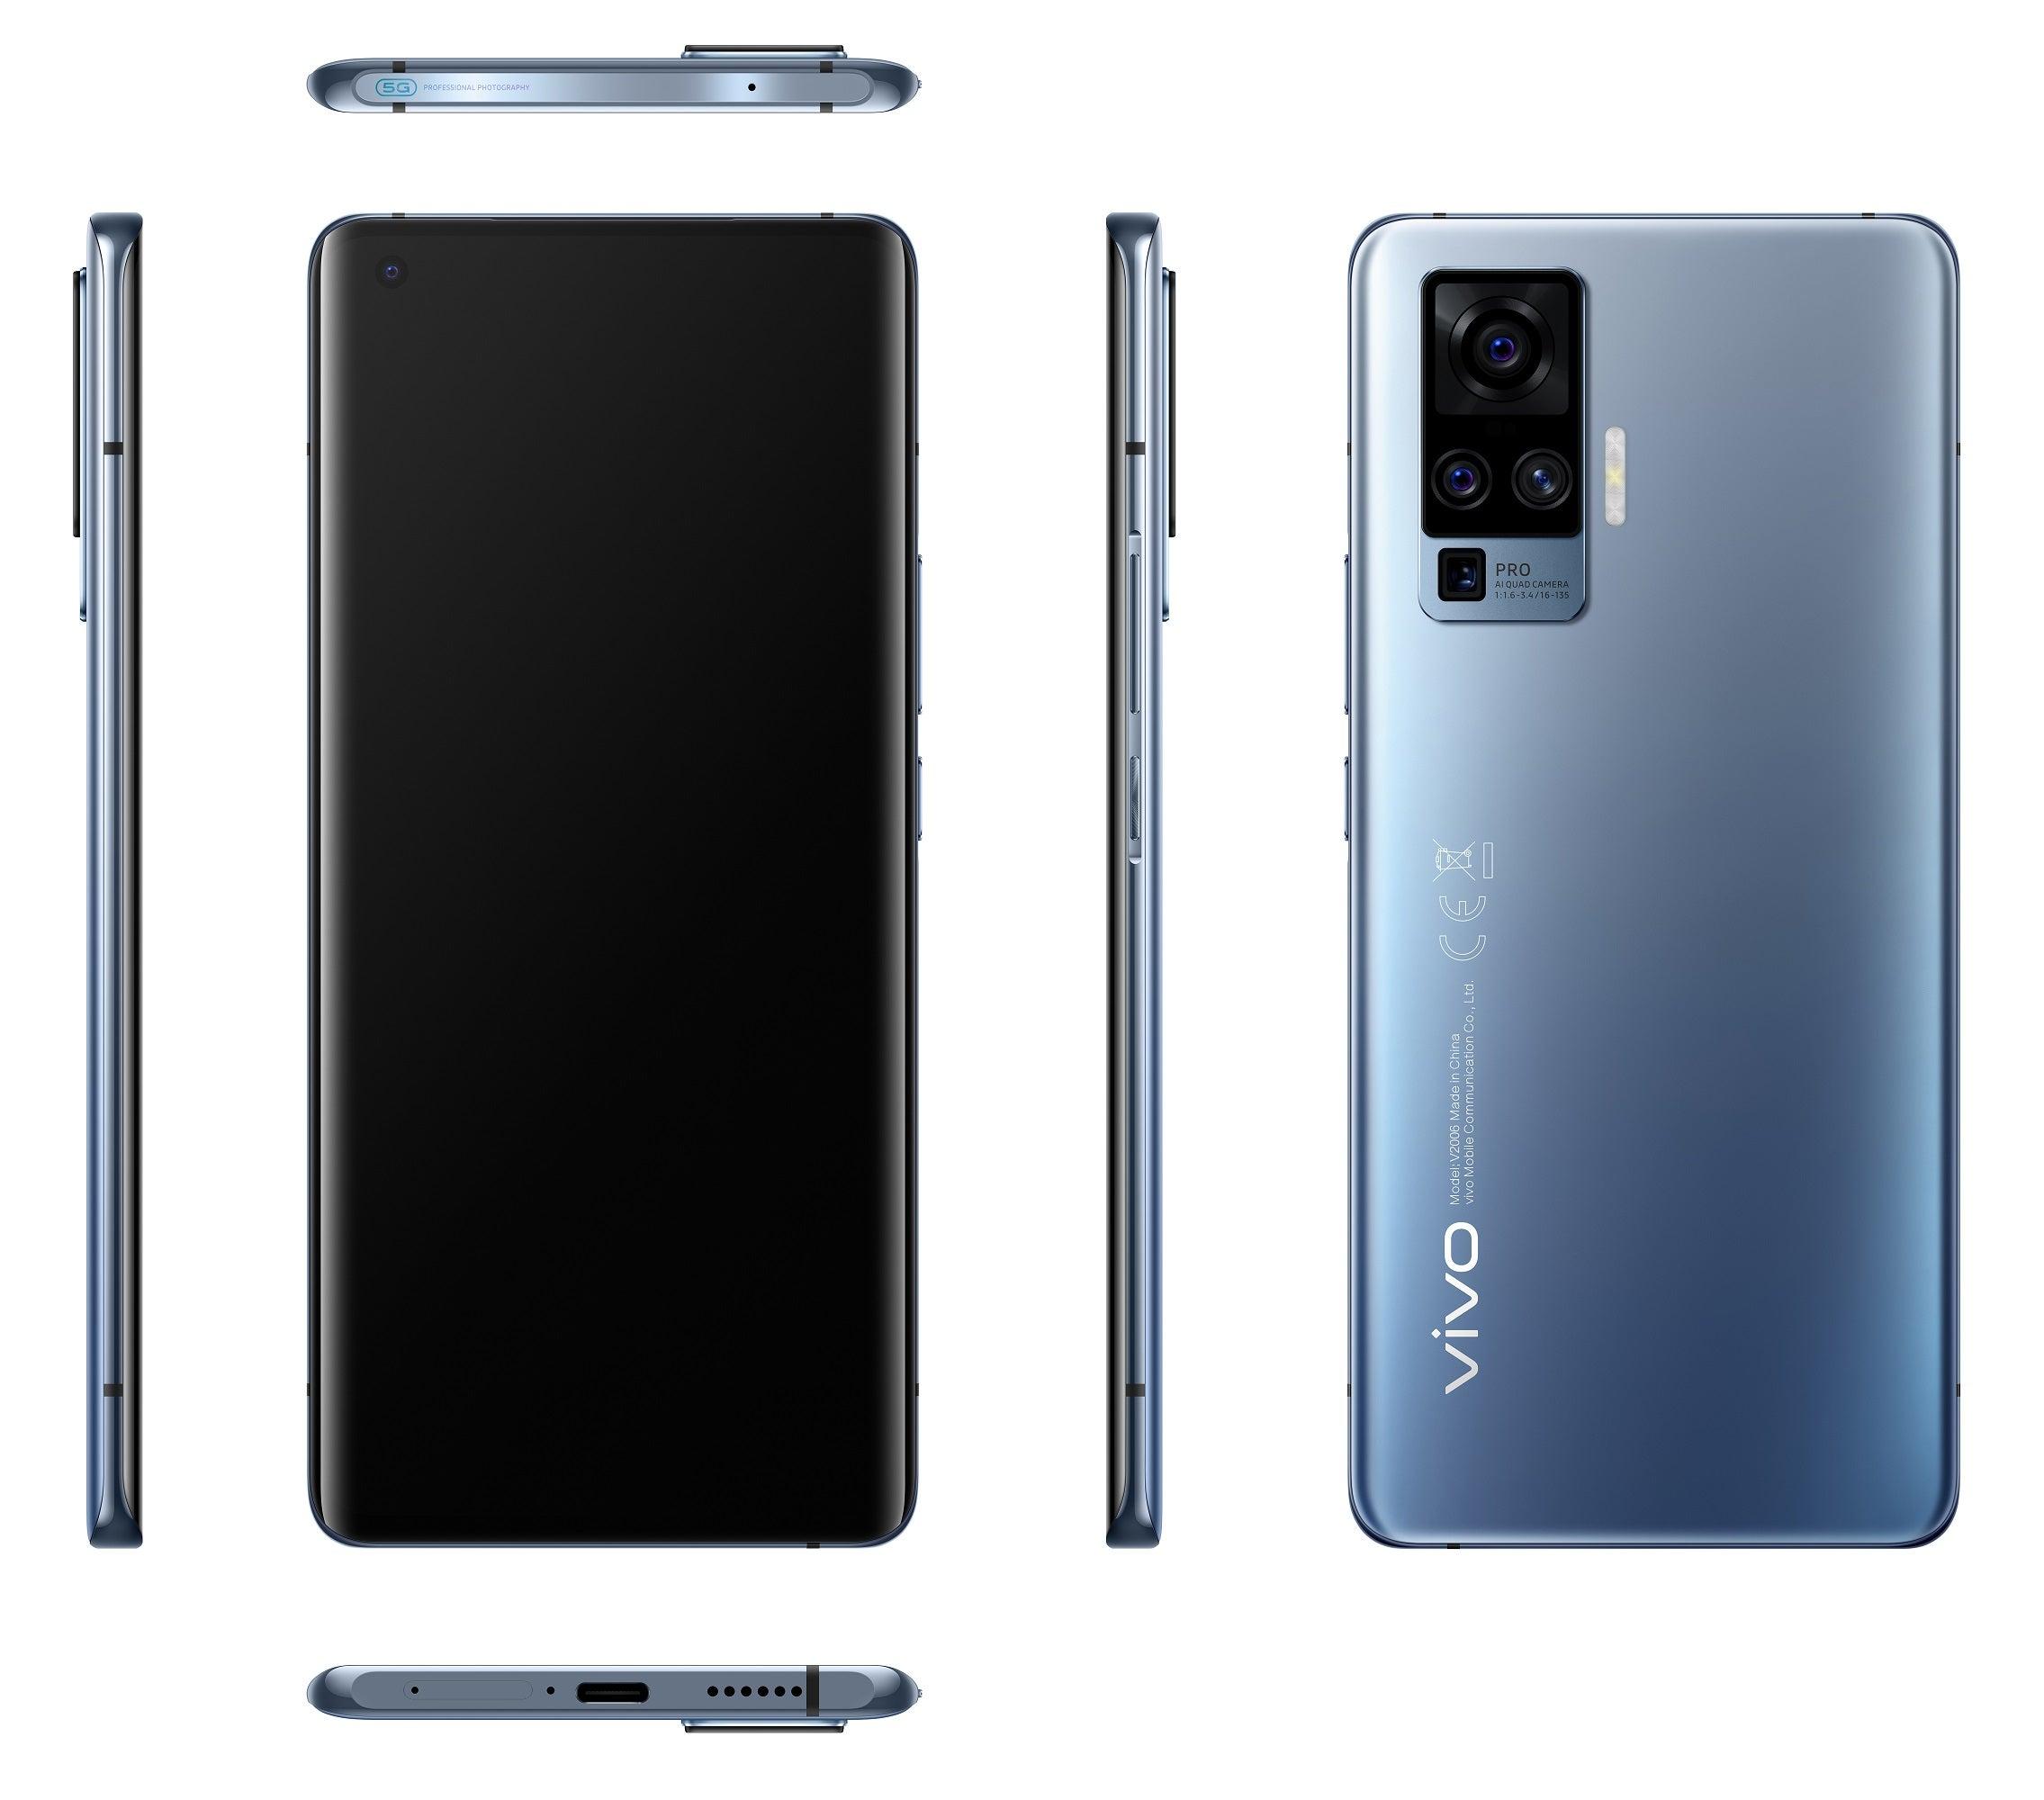 Smartphone X51 5G